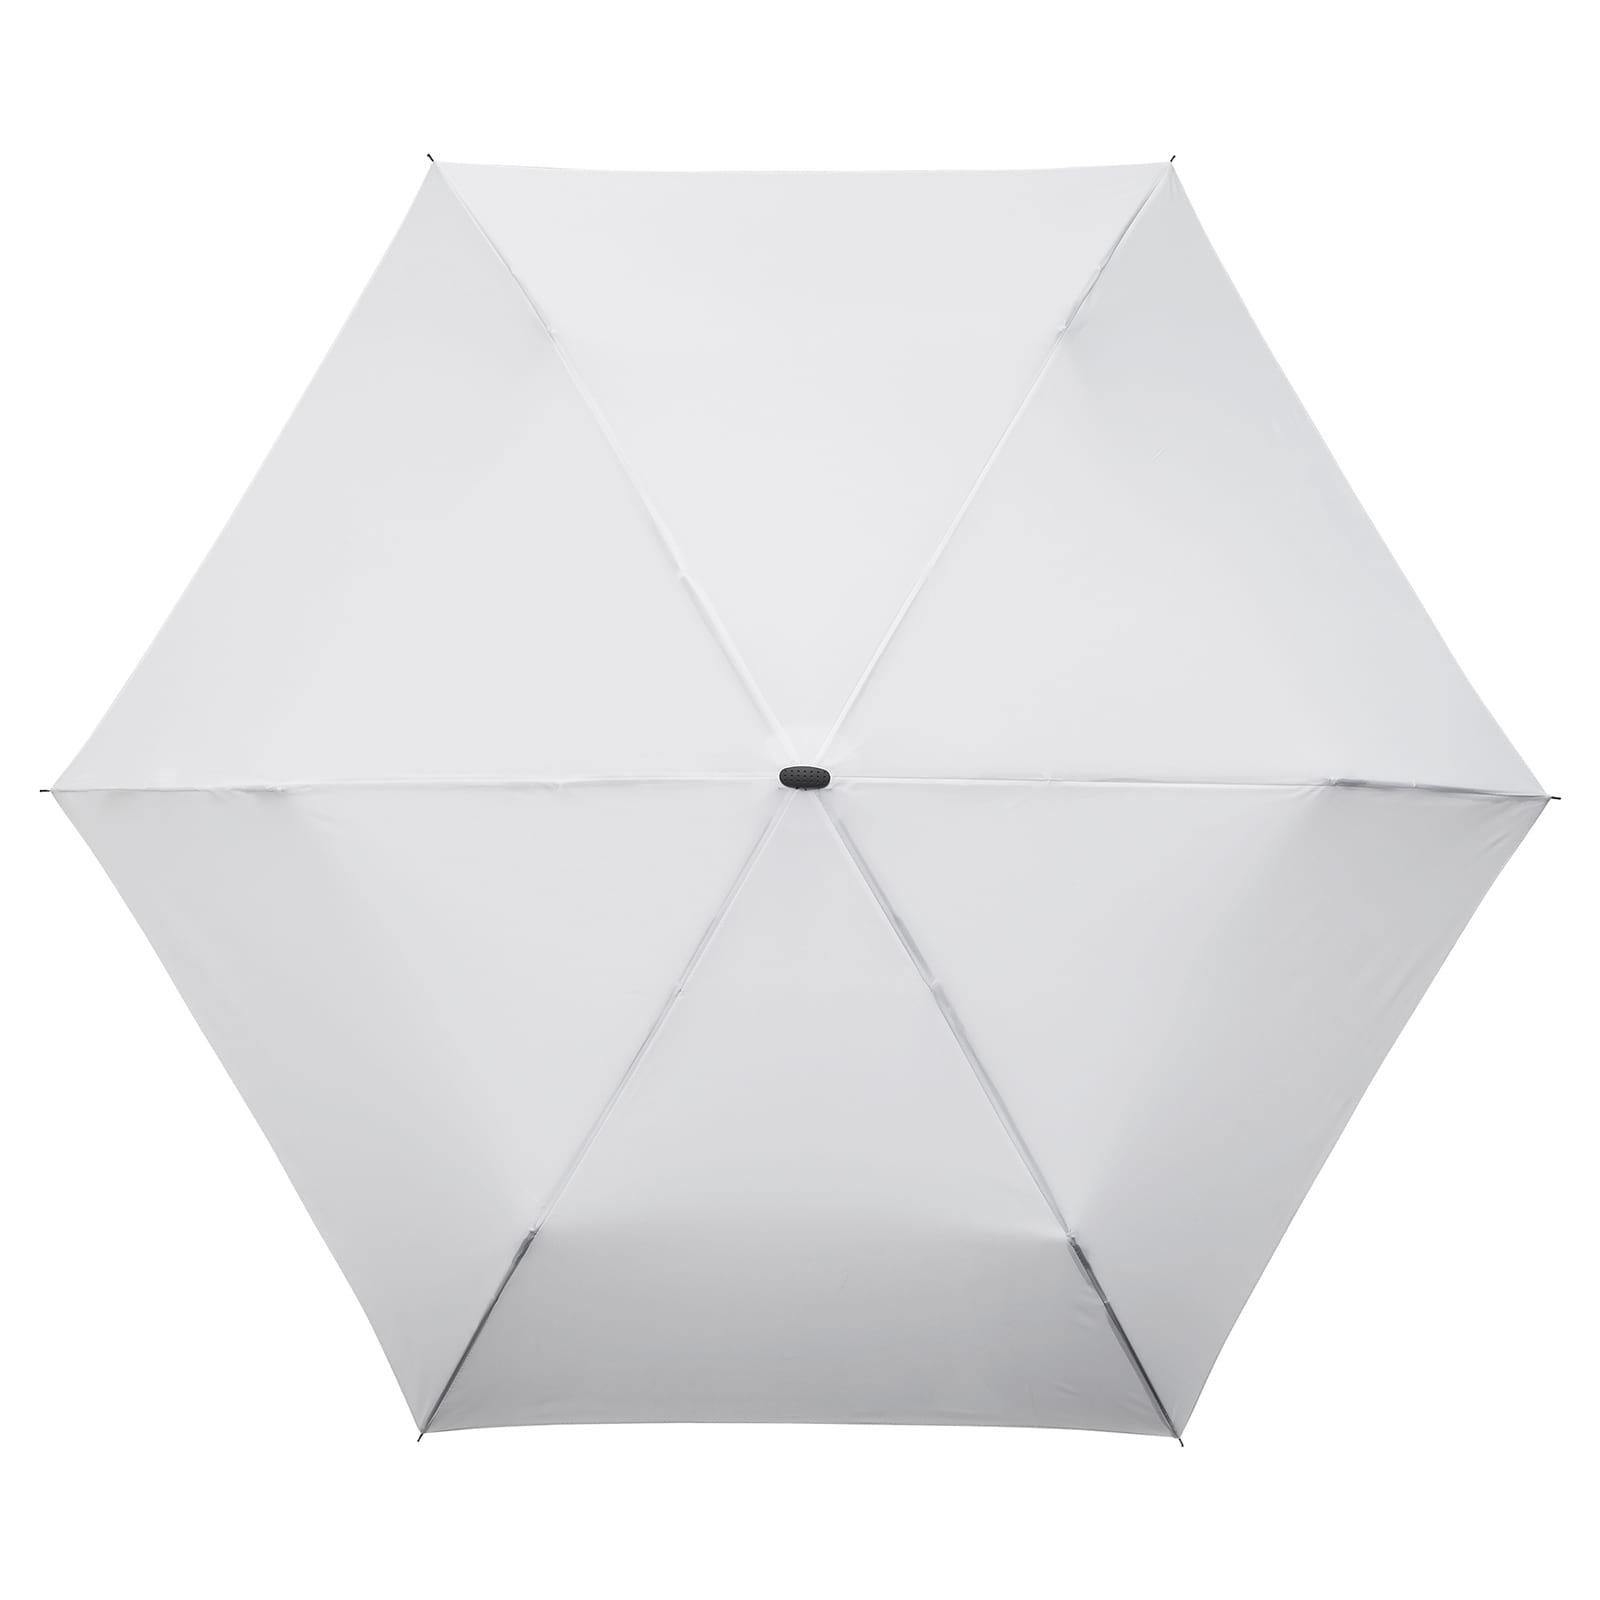 6ceda7b1f Impliva MiniMAX® Flat Folding Umbrella White | Design Is This